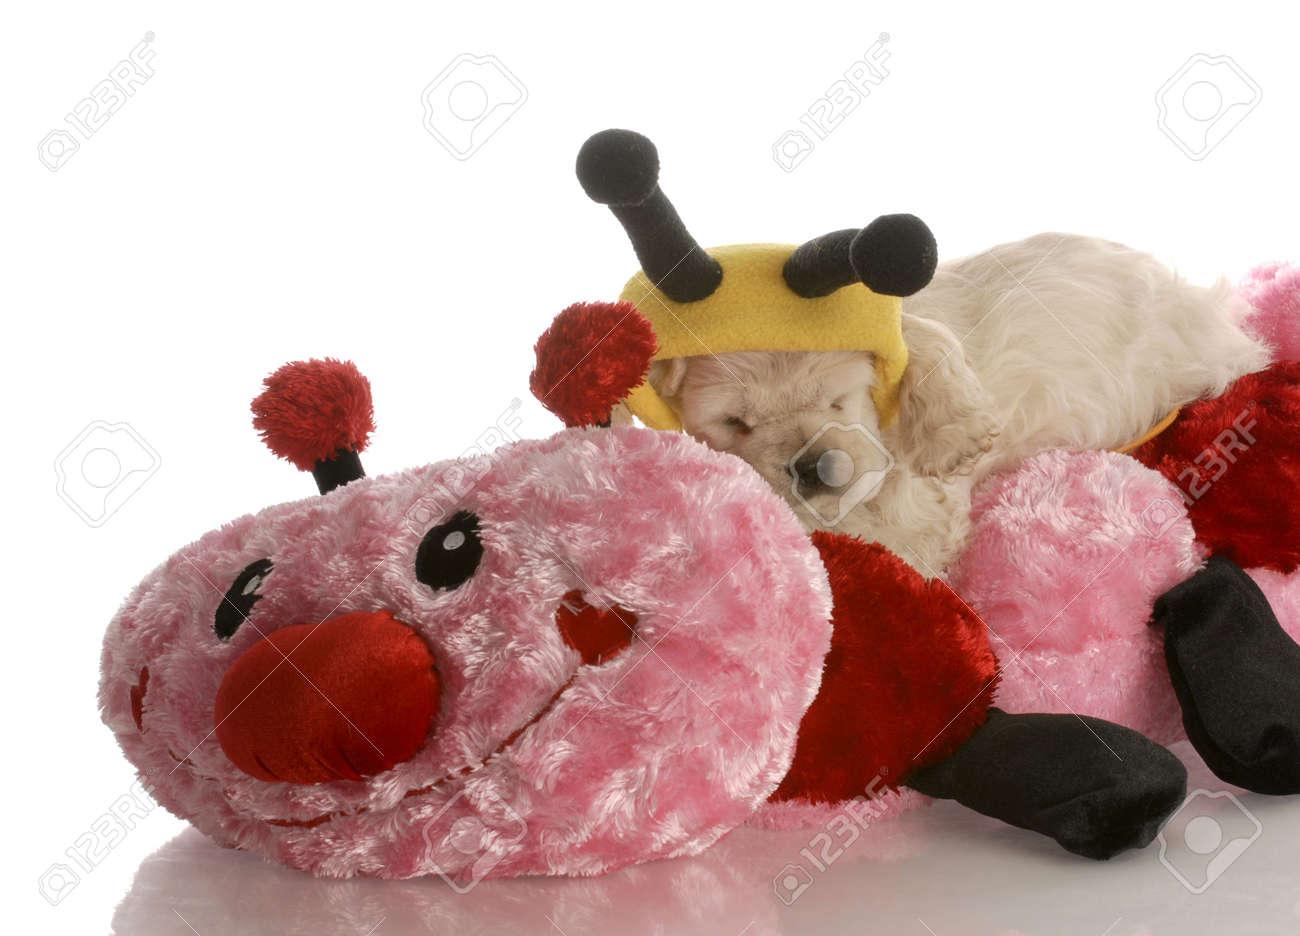 American Cocker Spaniel Puppy Sleeping On Stuffed Animal Stock Photo